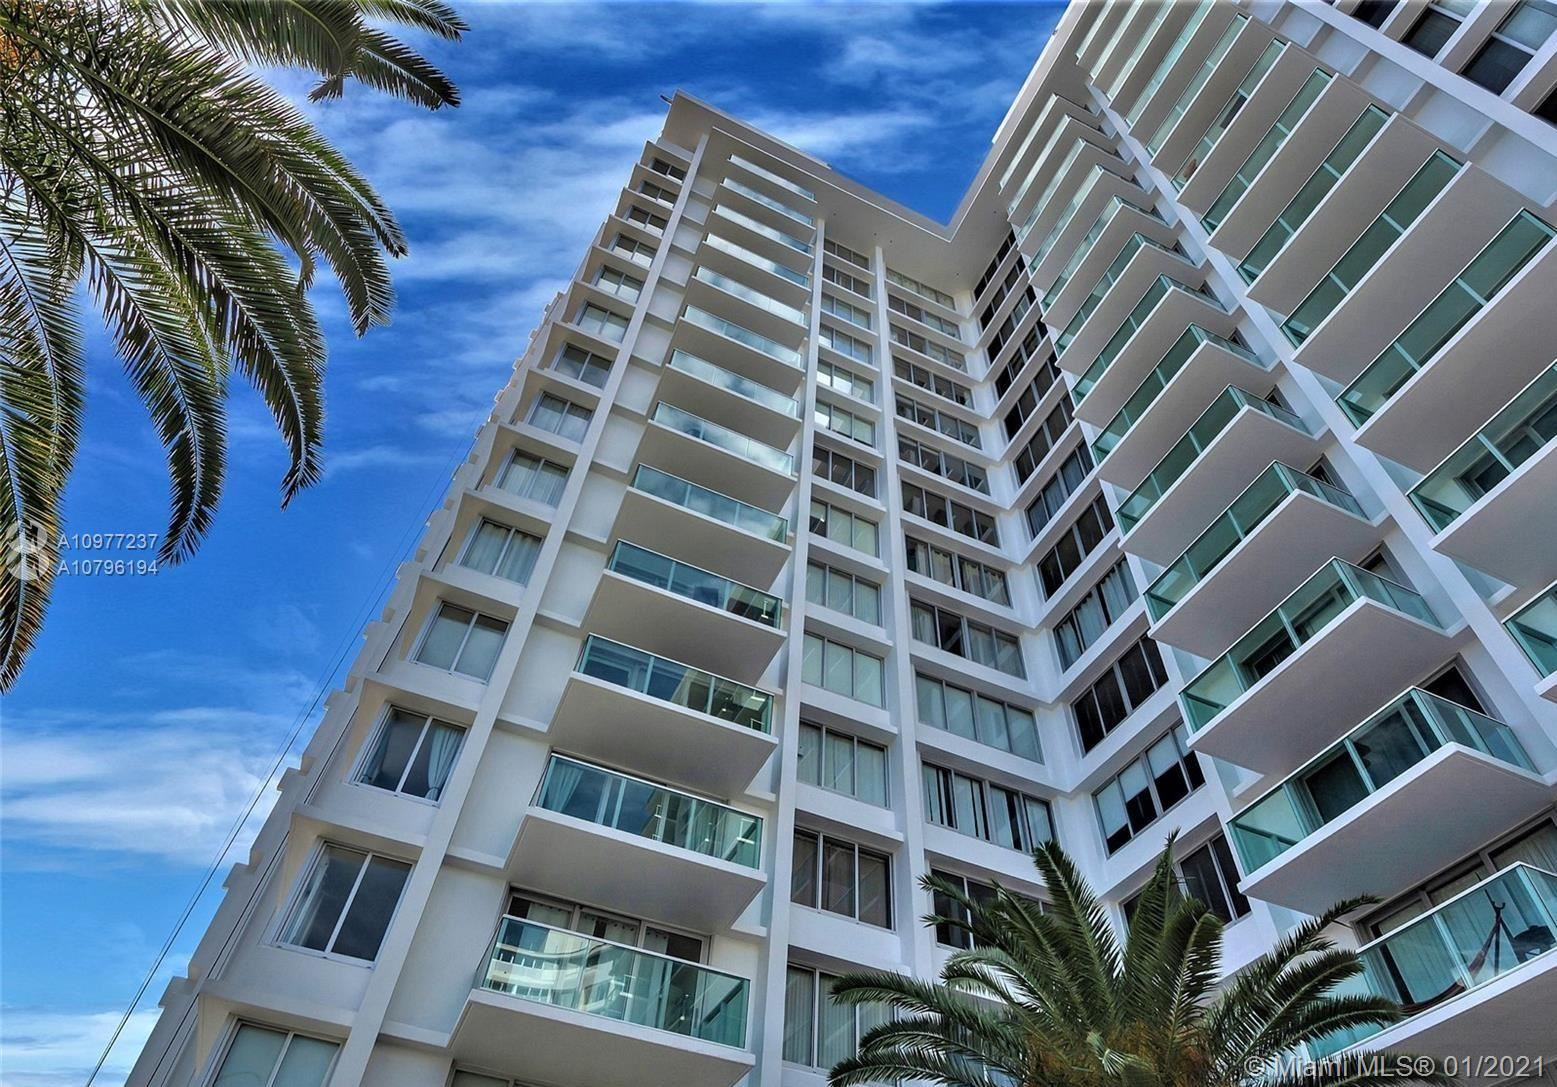 1000 WEST AV #915, Miami Beach, FL 33139 - #: A10977237